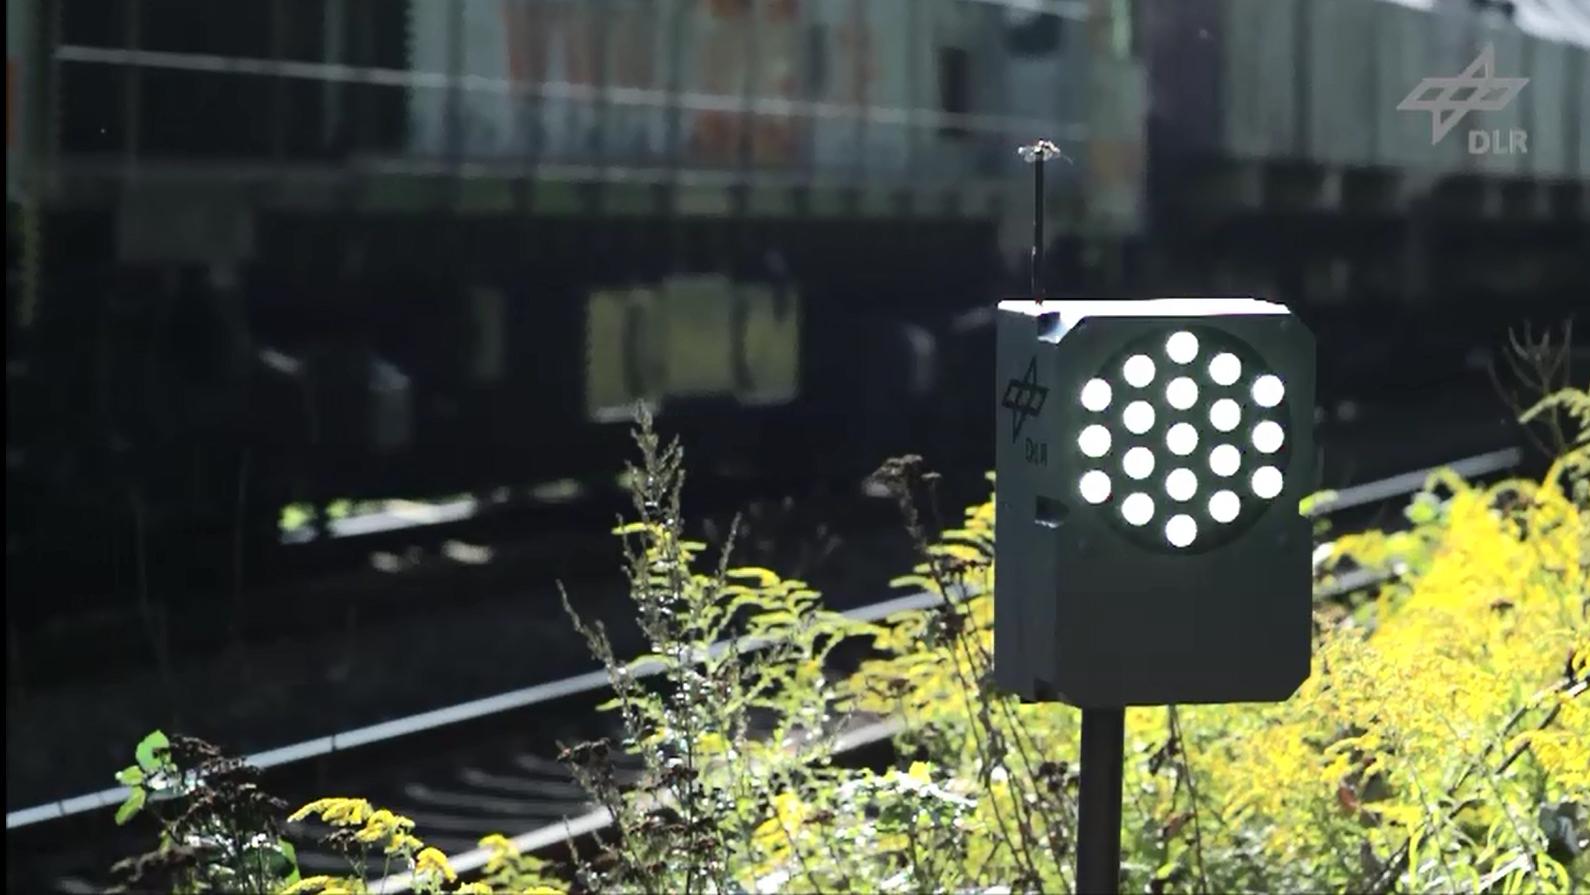 PeriLight: Blitzlicht zur Blicklenkung an Bahnübergängen